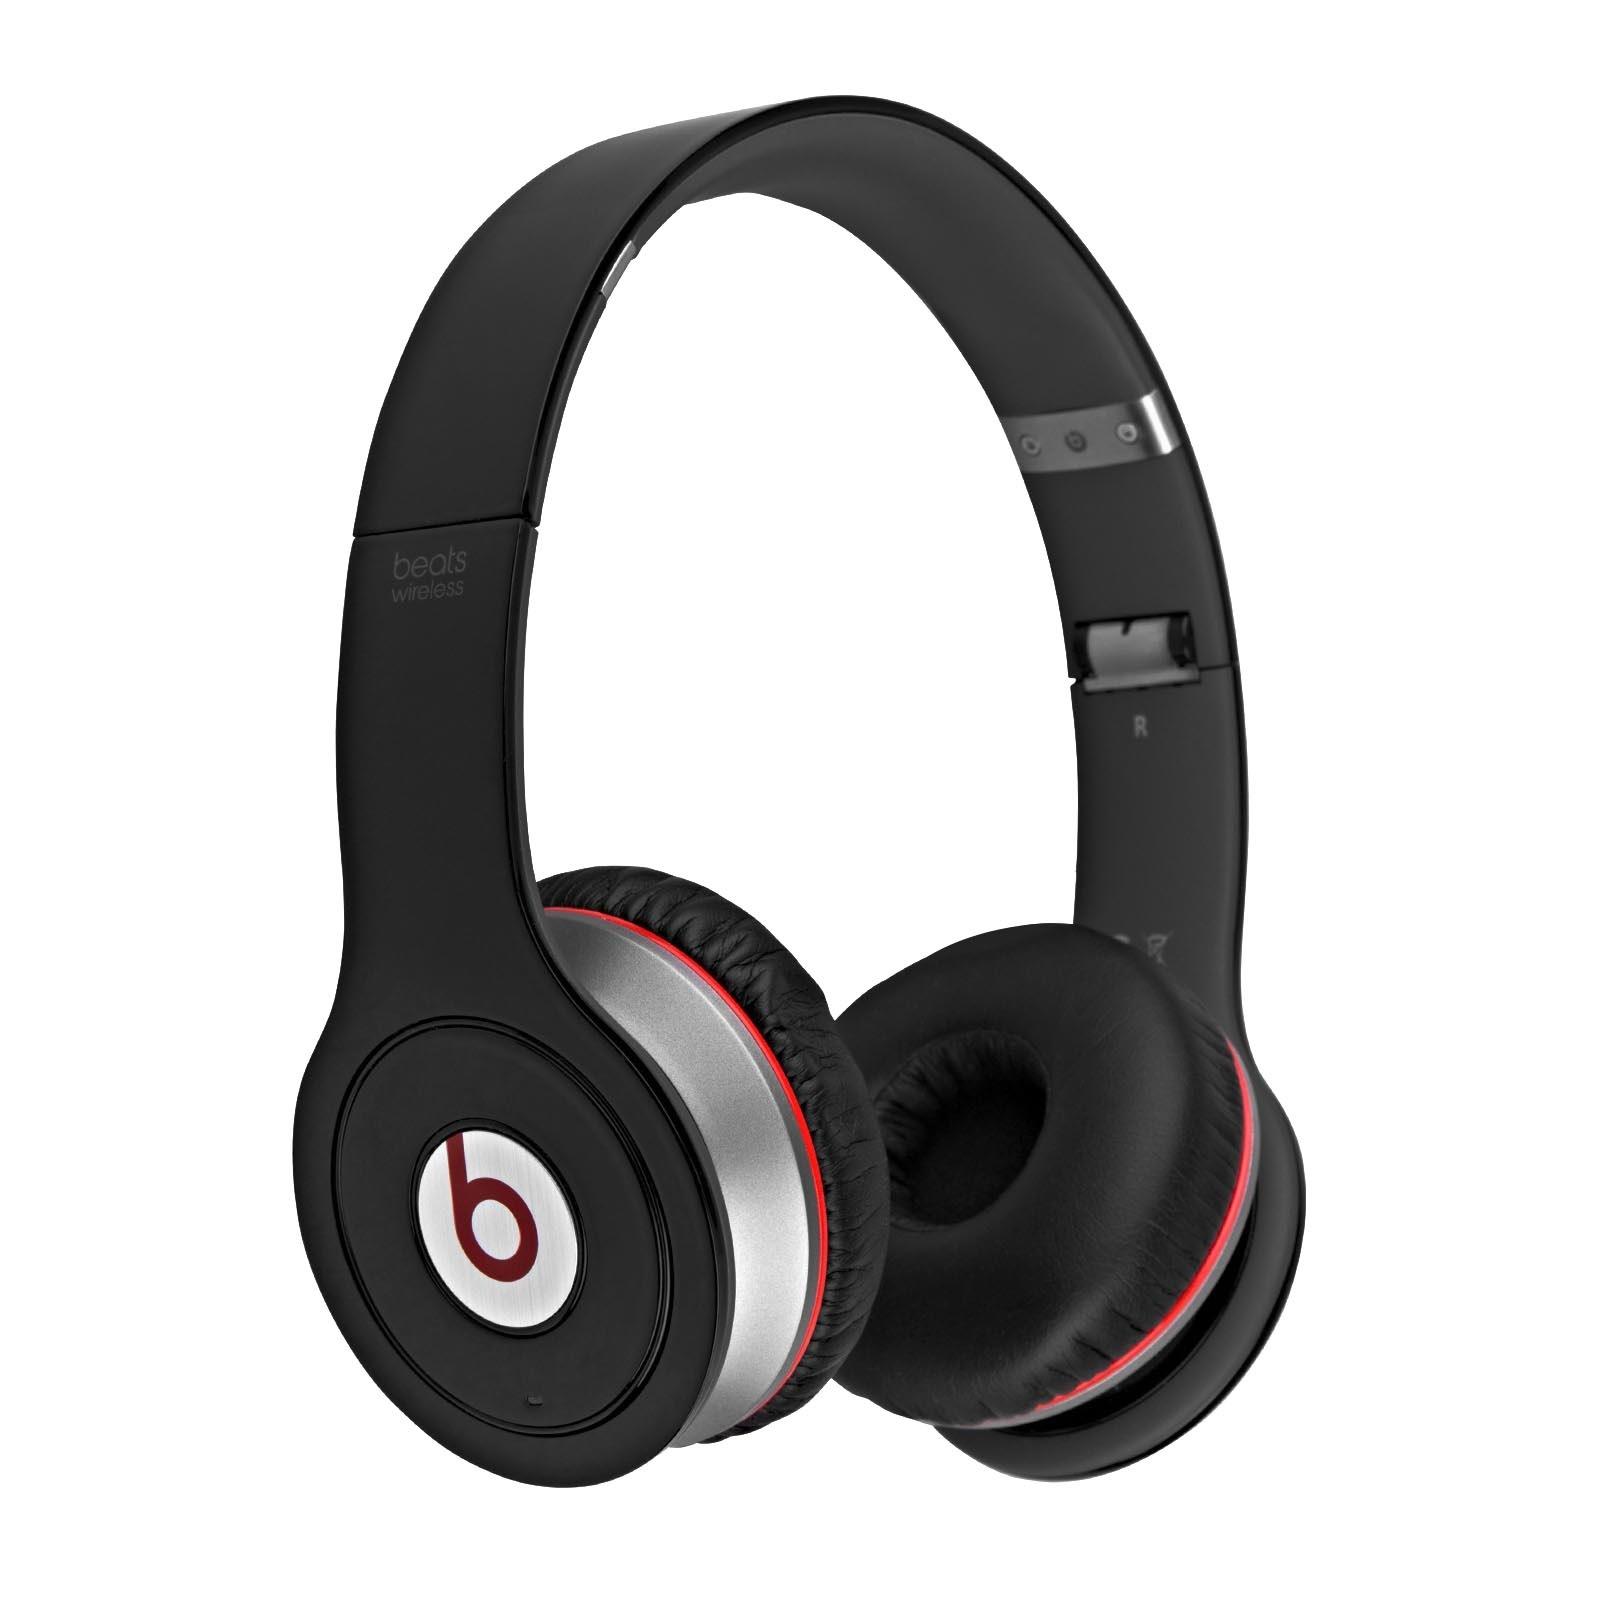 Beats wireless headphones noise cancelling - wireless headphones beats red